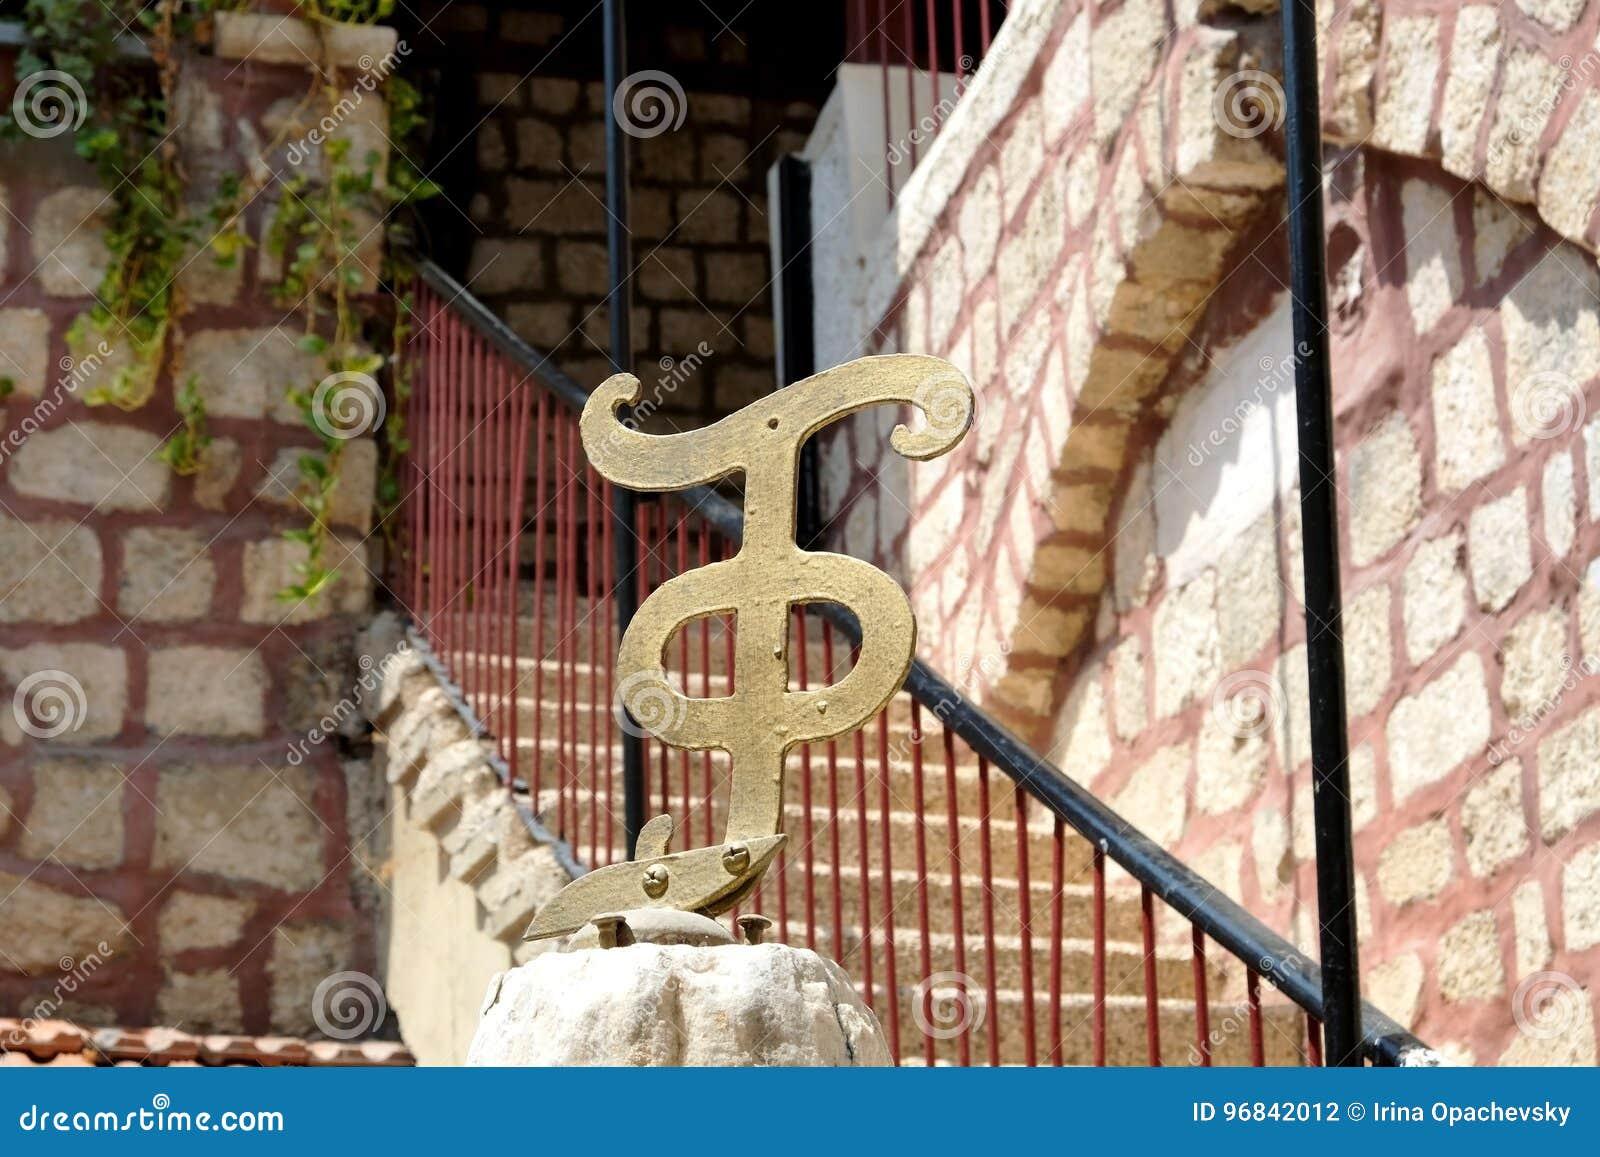 Tafos Is A Symbol Of The Greek Orthodox Brotherhood Editorial